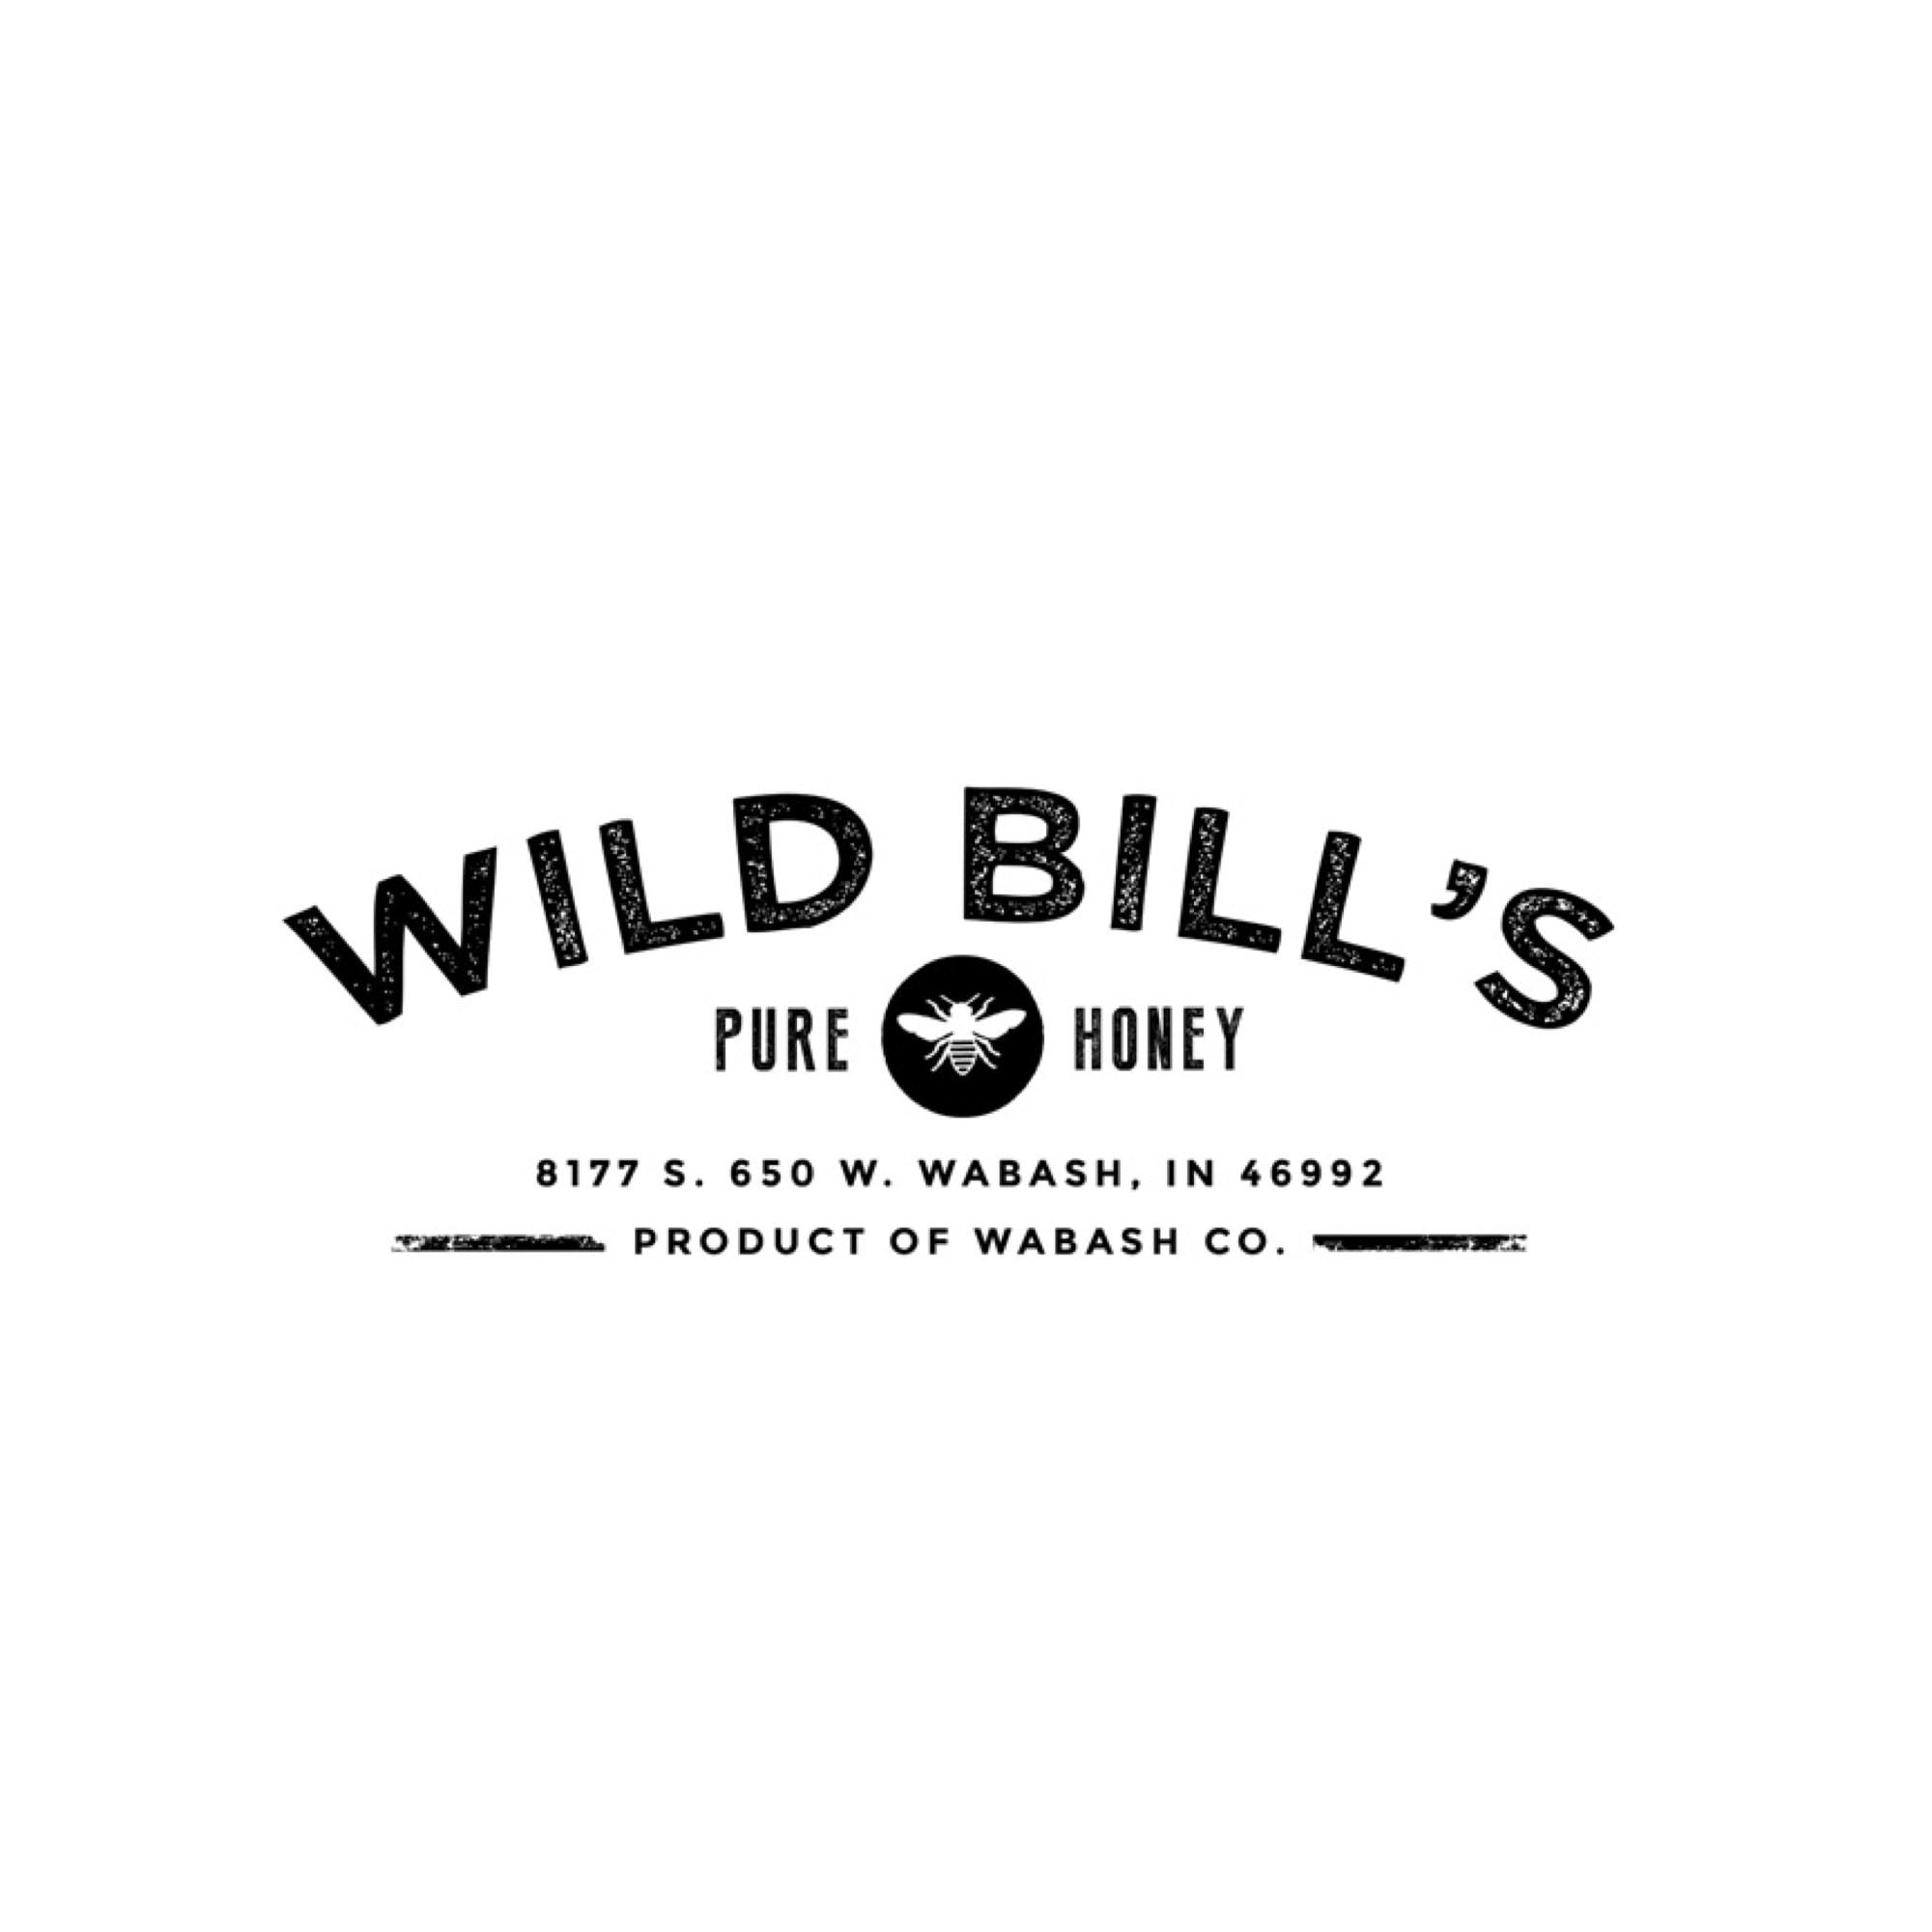 Wild Bills Honey 2000×2000